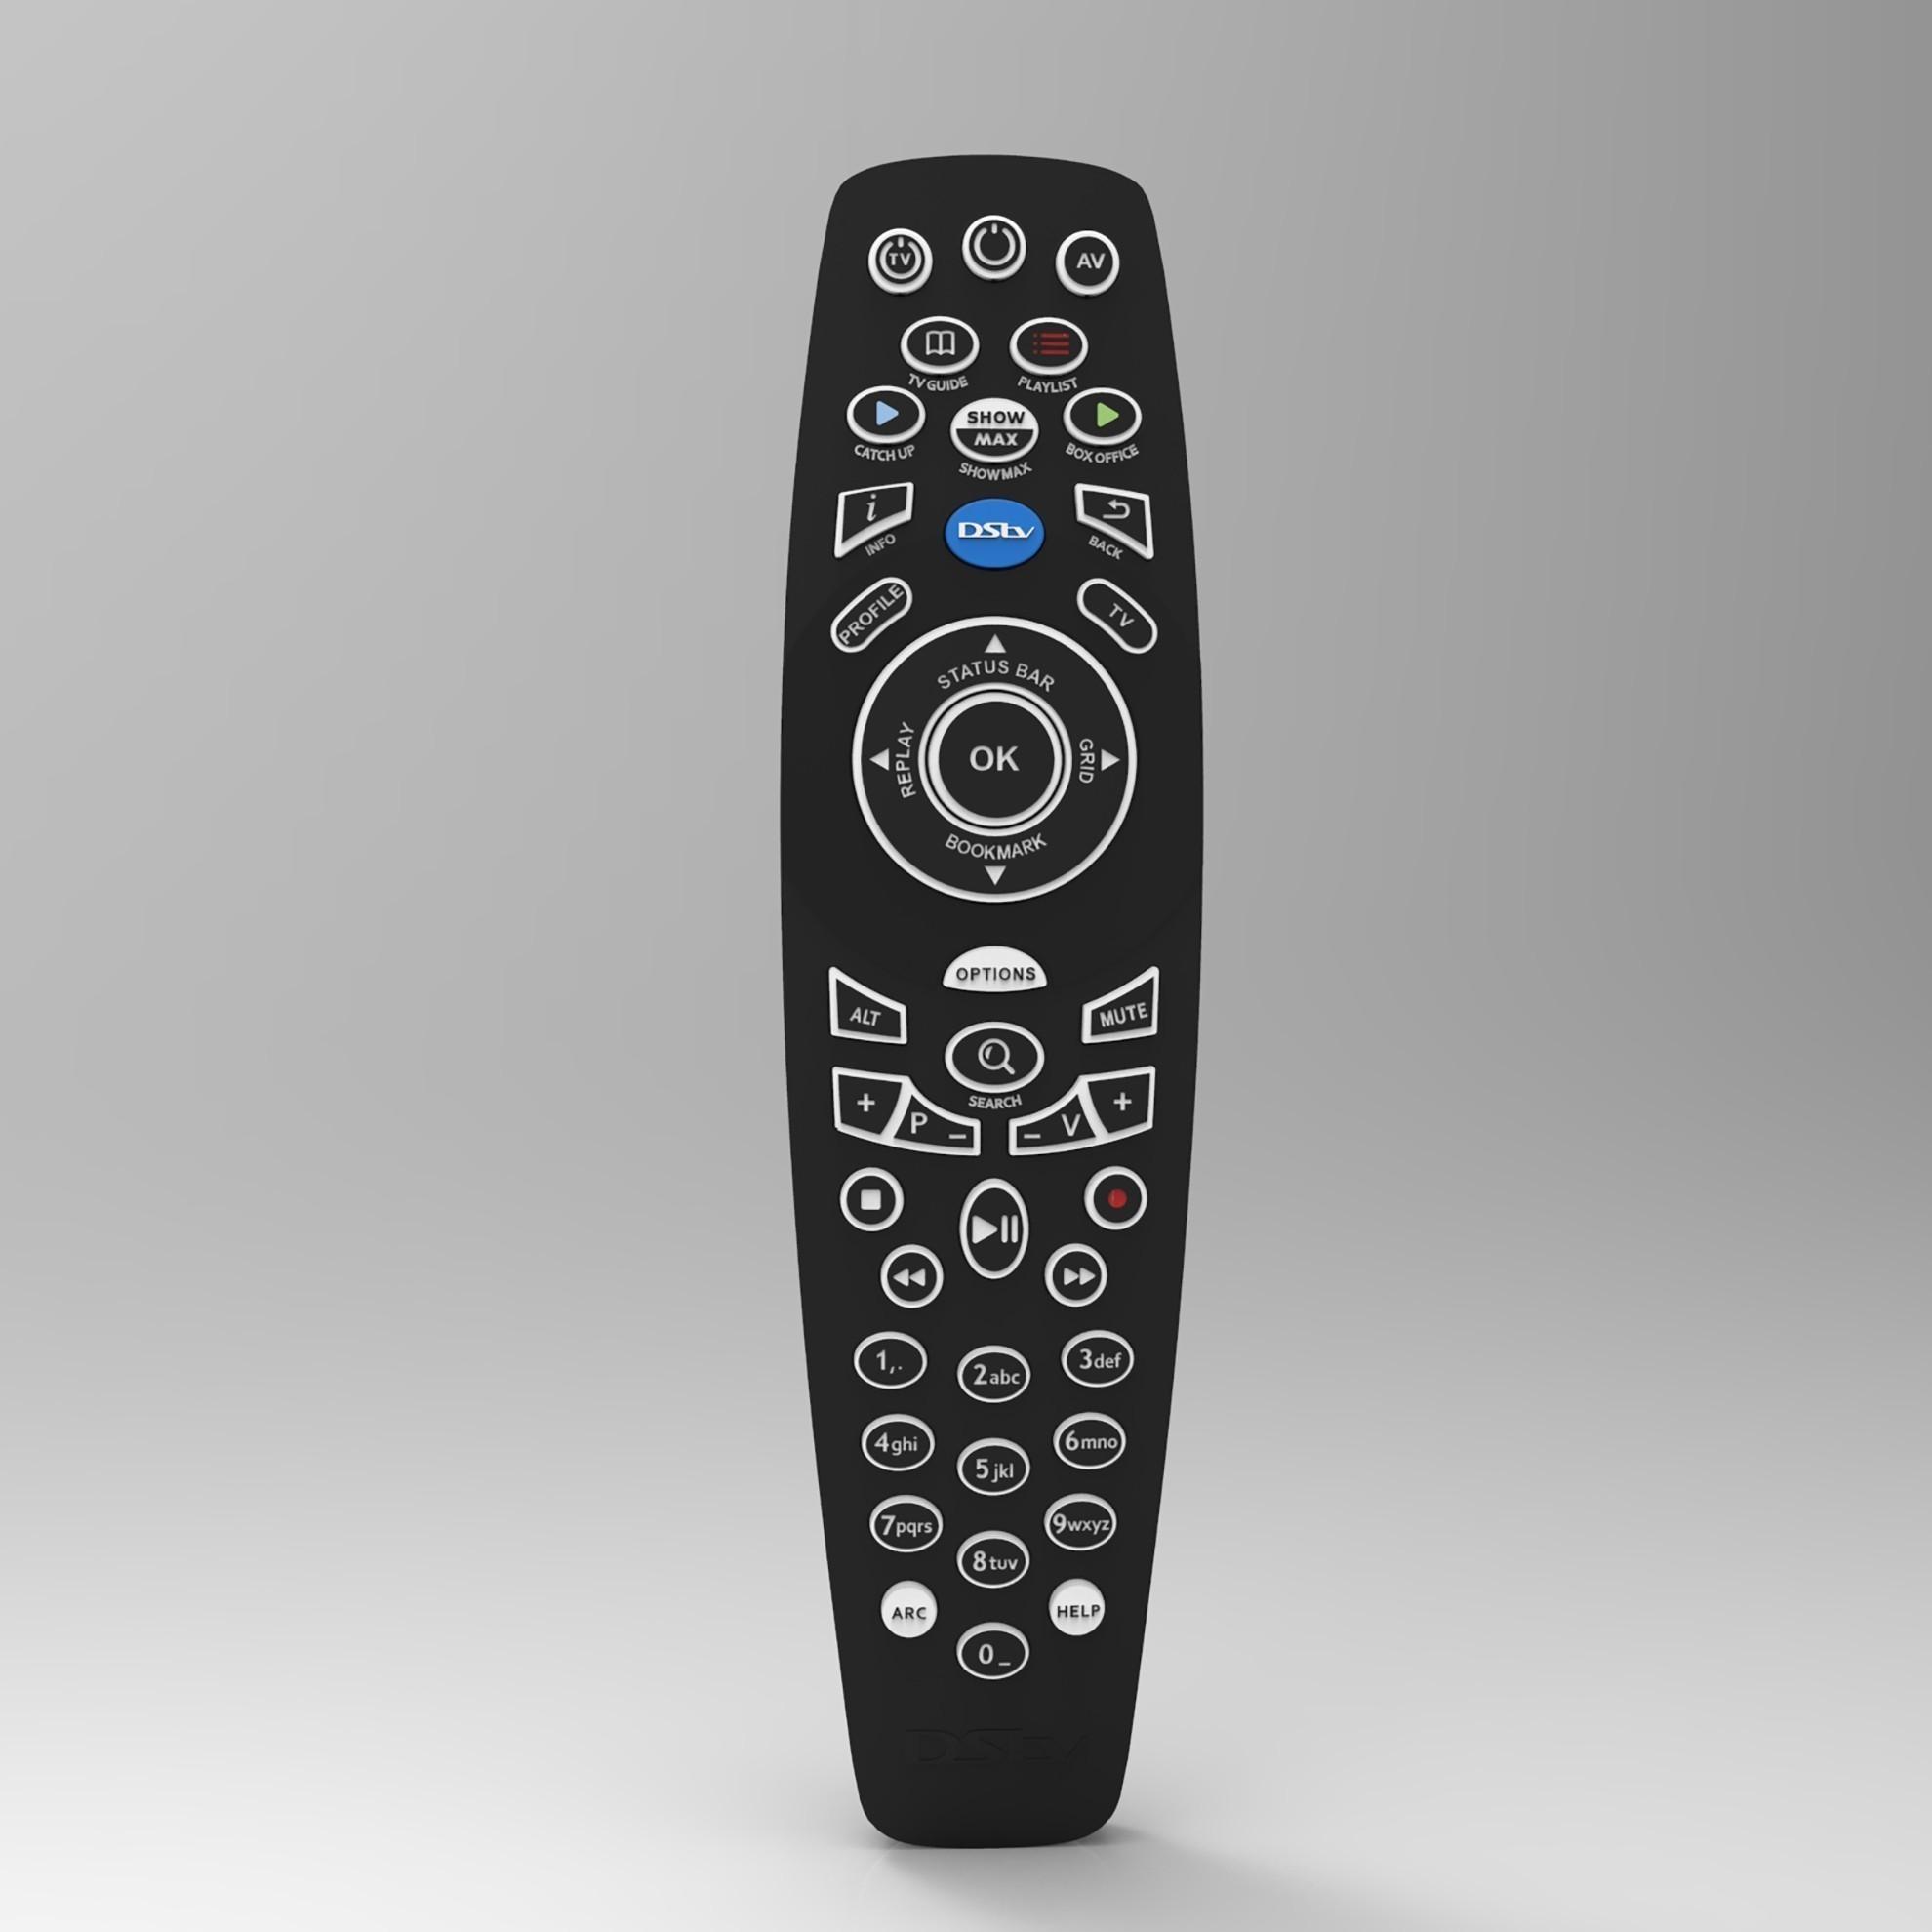 3D-DSTV-Remote